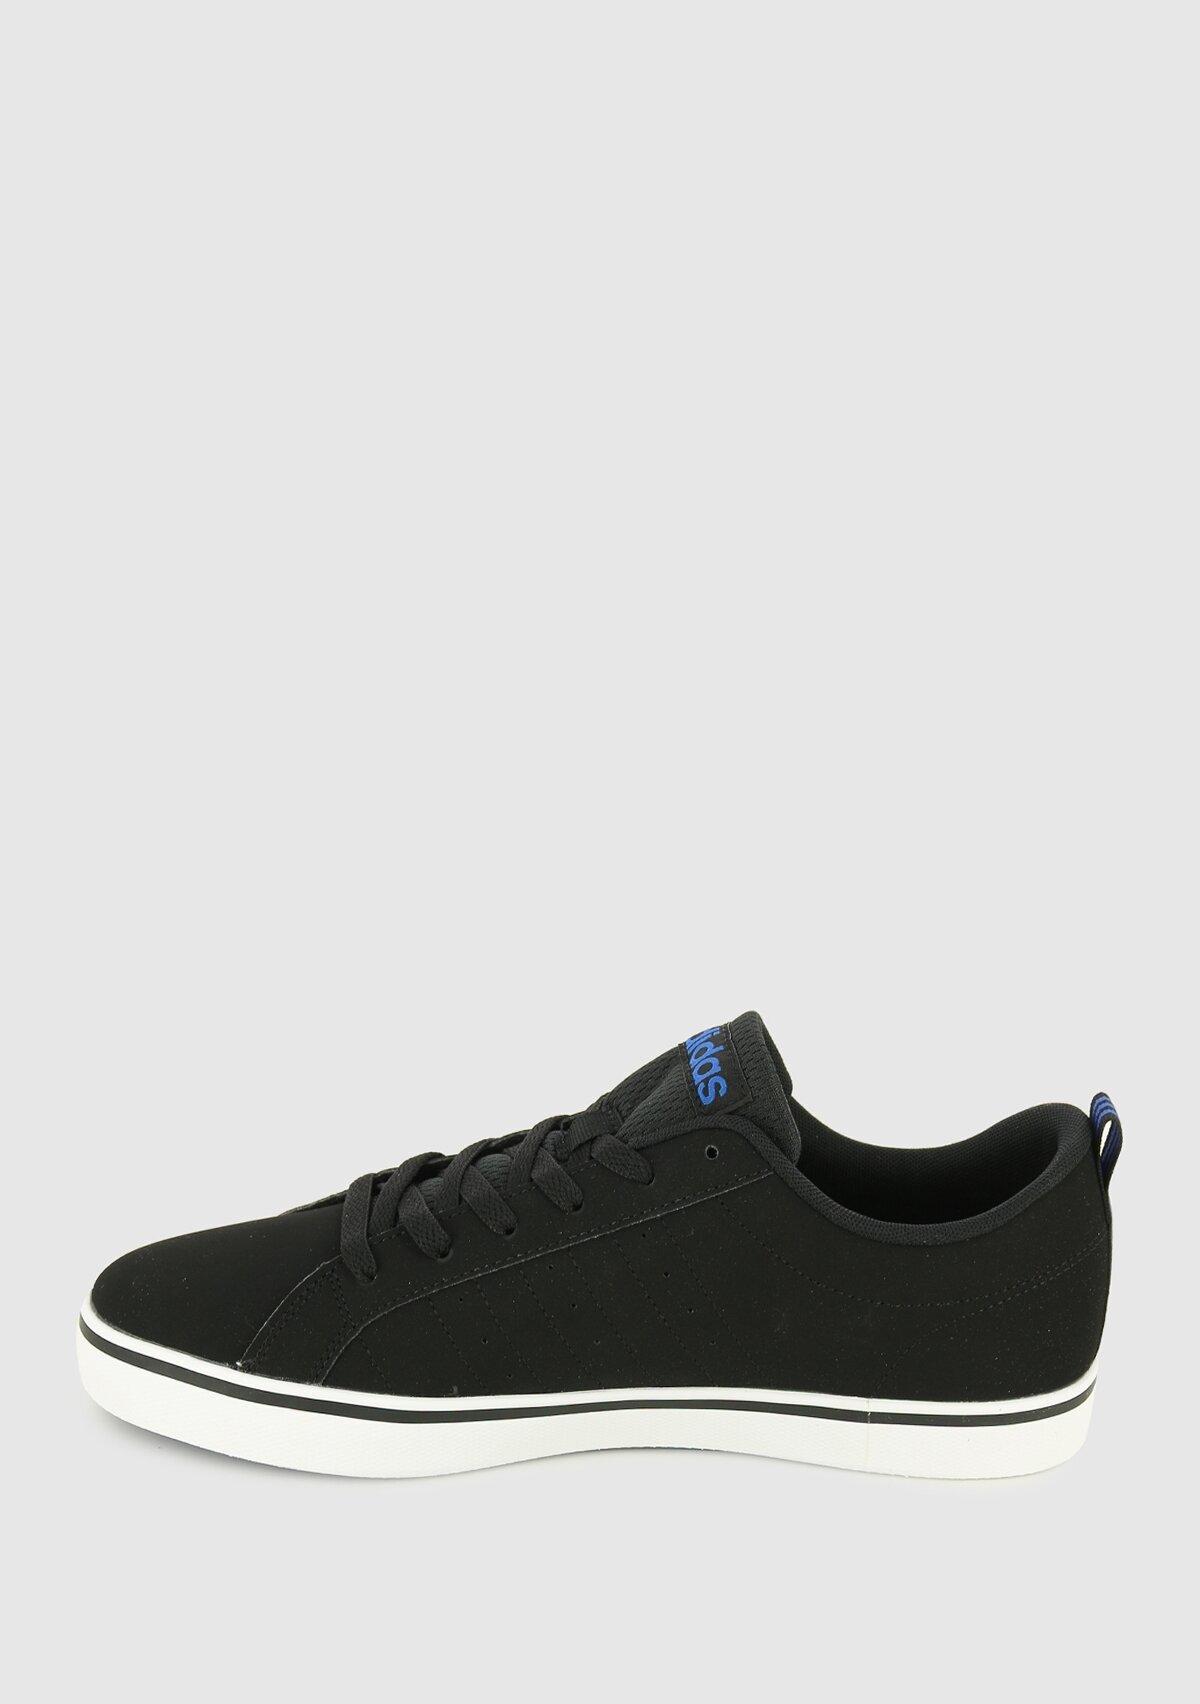 resm Vs Pace Siyah Erkek Tenis Ayakkabısı Aw4591